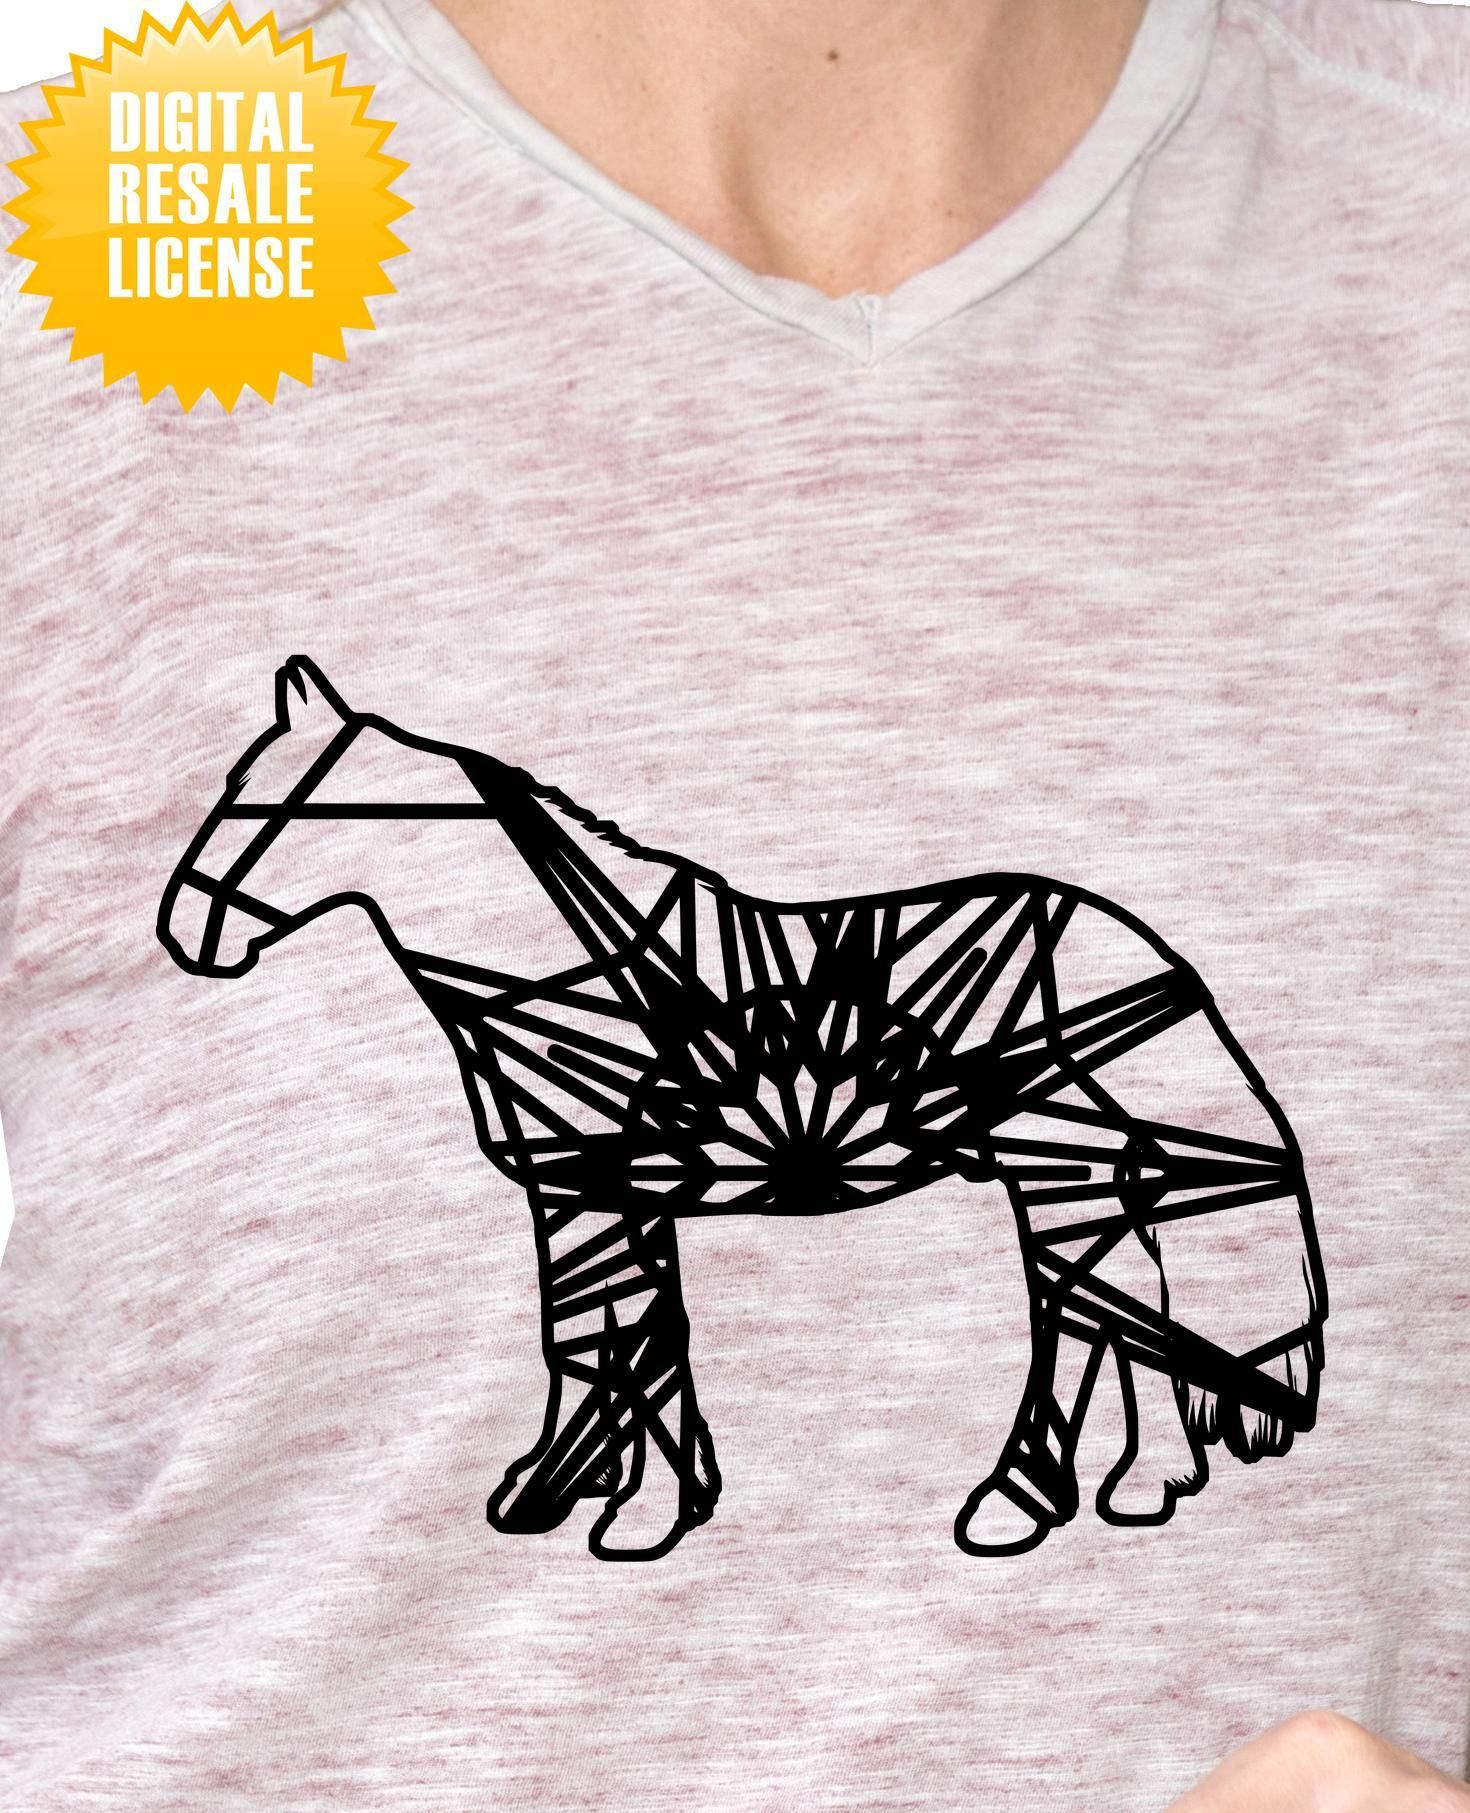 Mustang Mandala Winter Edition SVG Digital Image Sell